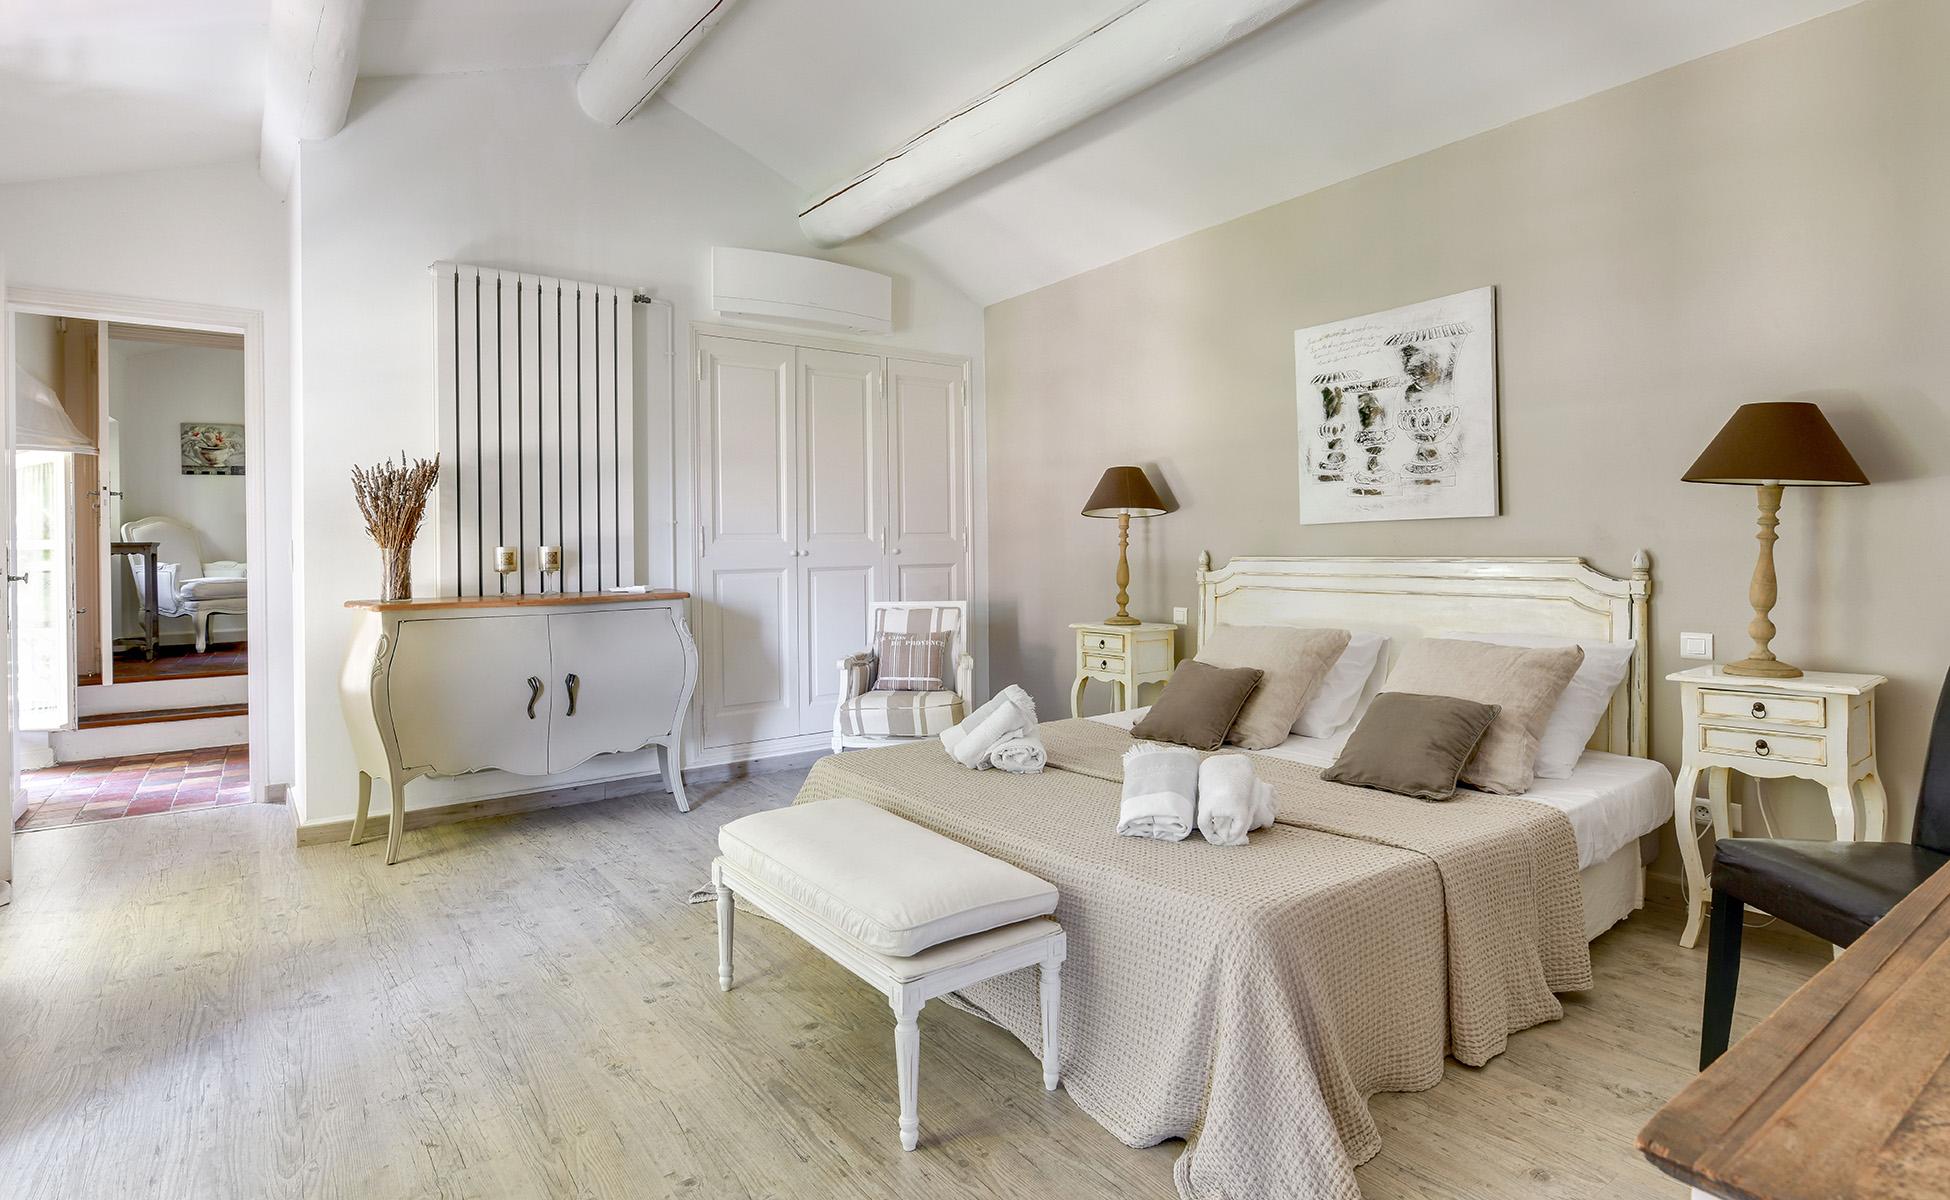 Lovelydays luxury service apartment rental - St Rémy de Provence and surroundings - Ameu Mas - Partner - 6 bedrooms - 6 bathrooms - Queen bed - f824625da103 - Lovelydays